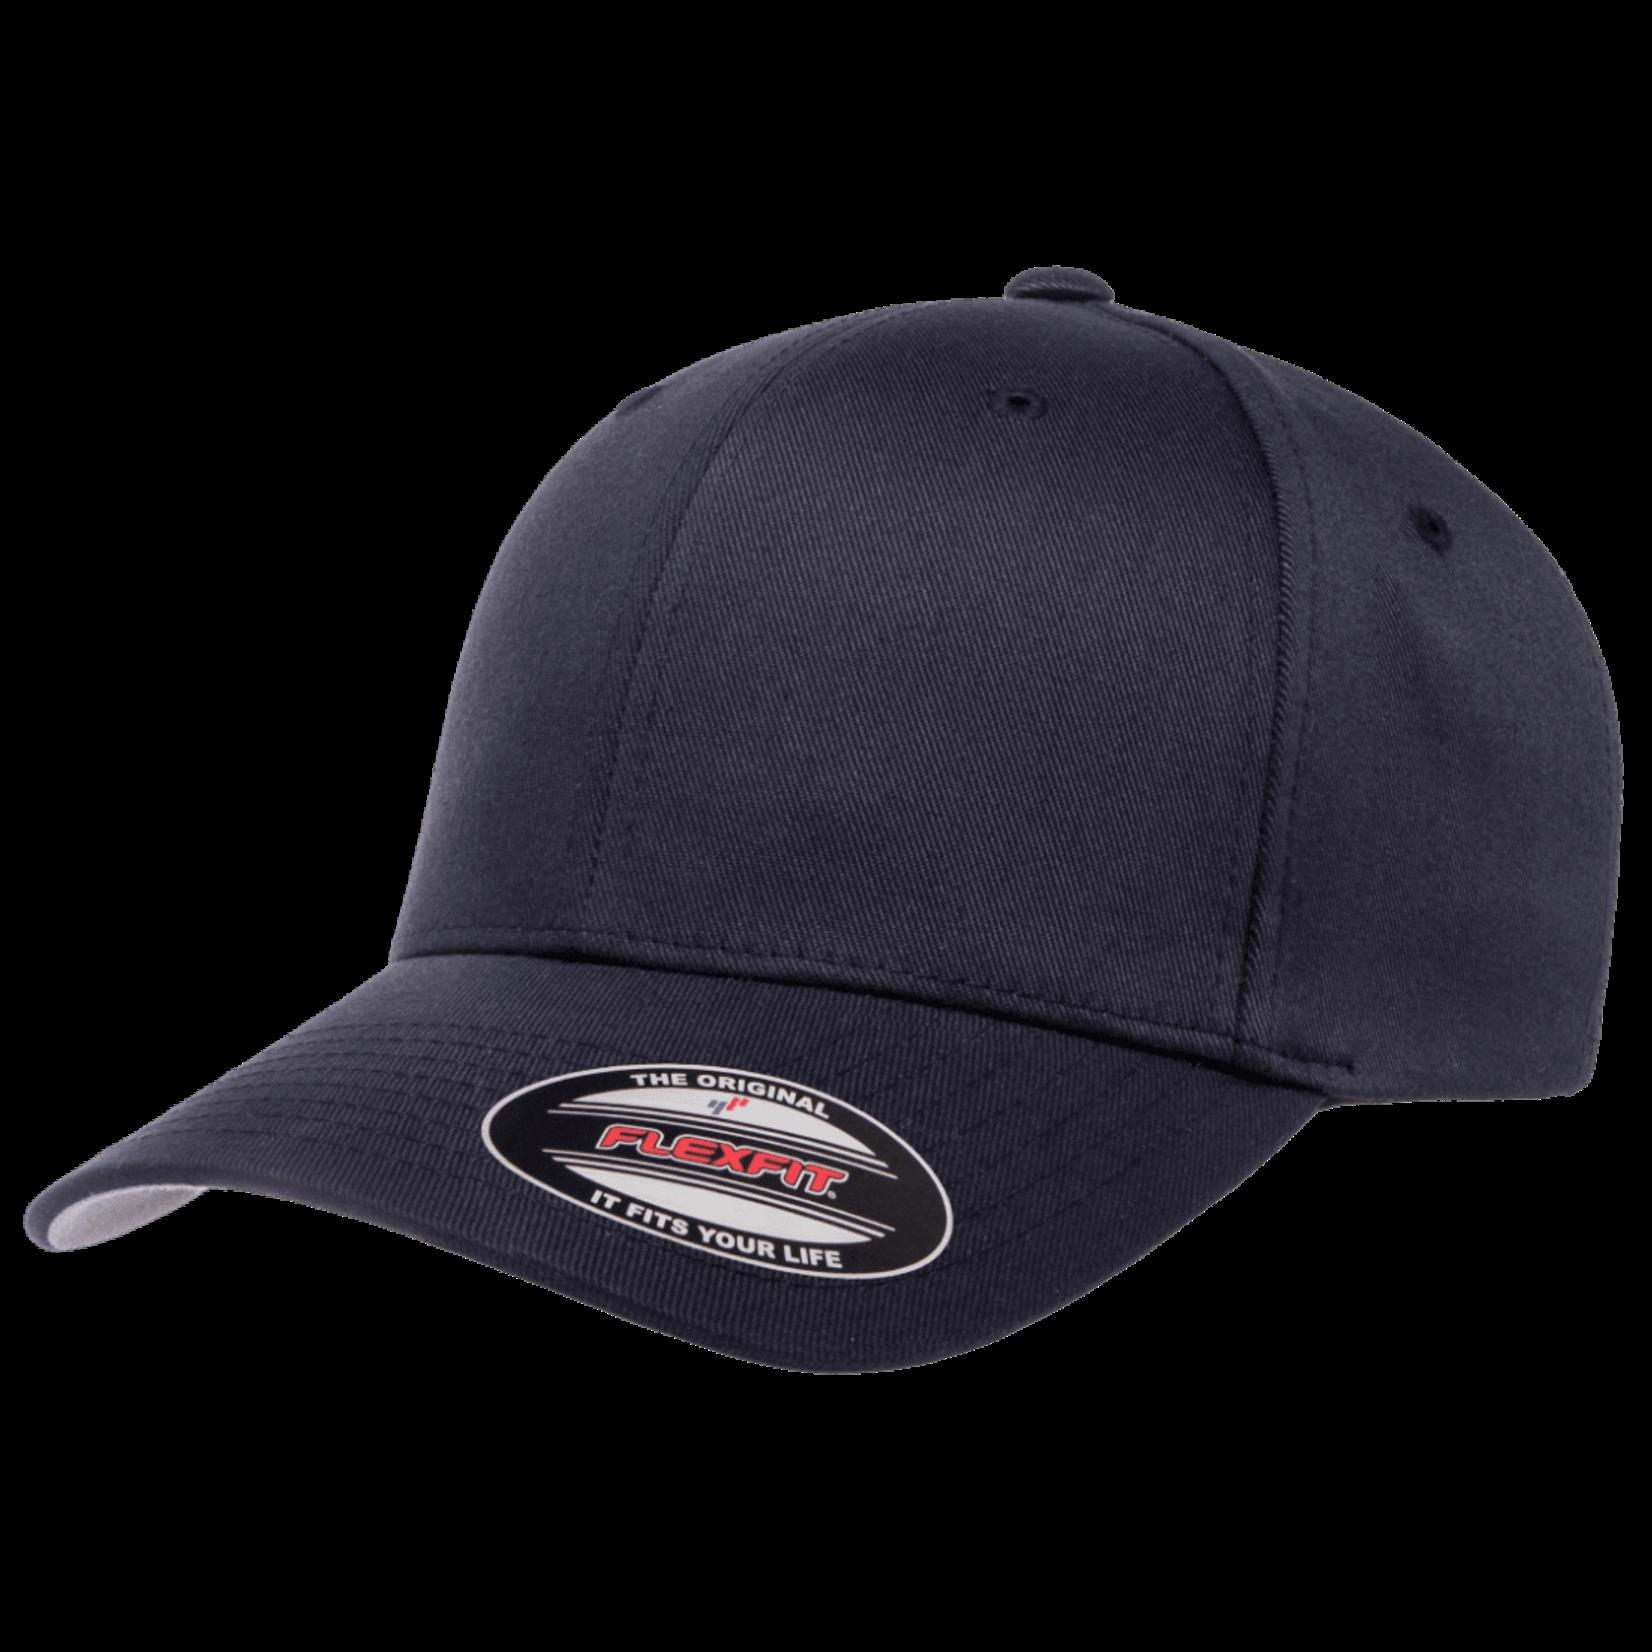 Flexfit Flexfit 6277 Classic Ballcap - Dark Navy